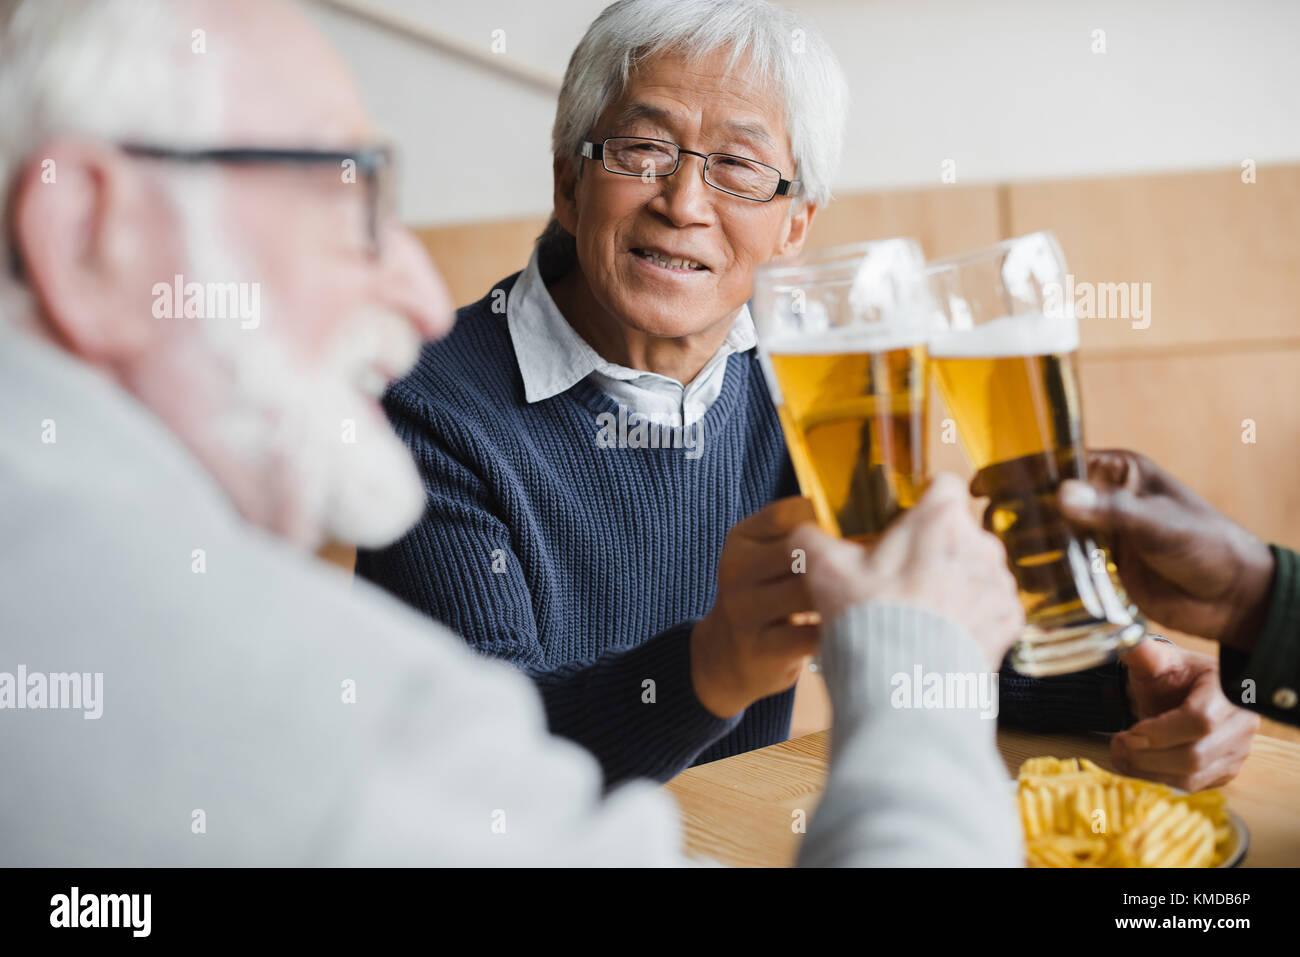 senior friends clinking glasses of beer - Stock Image